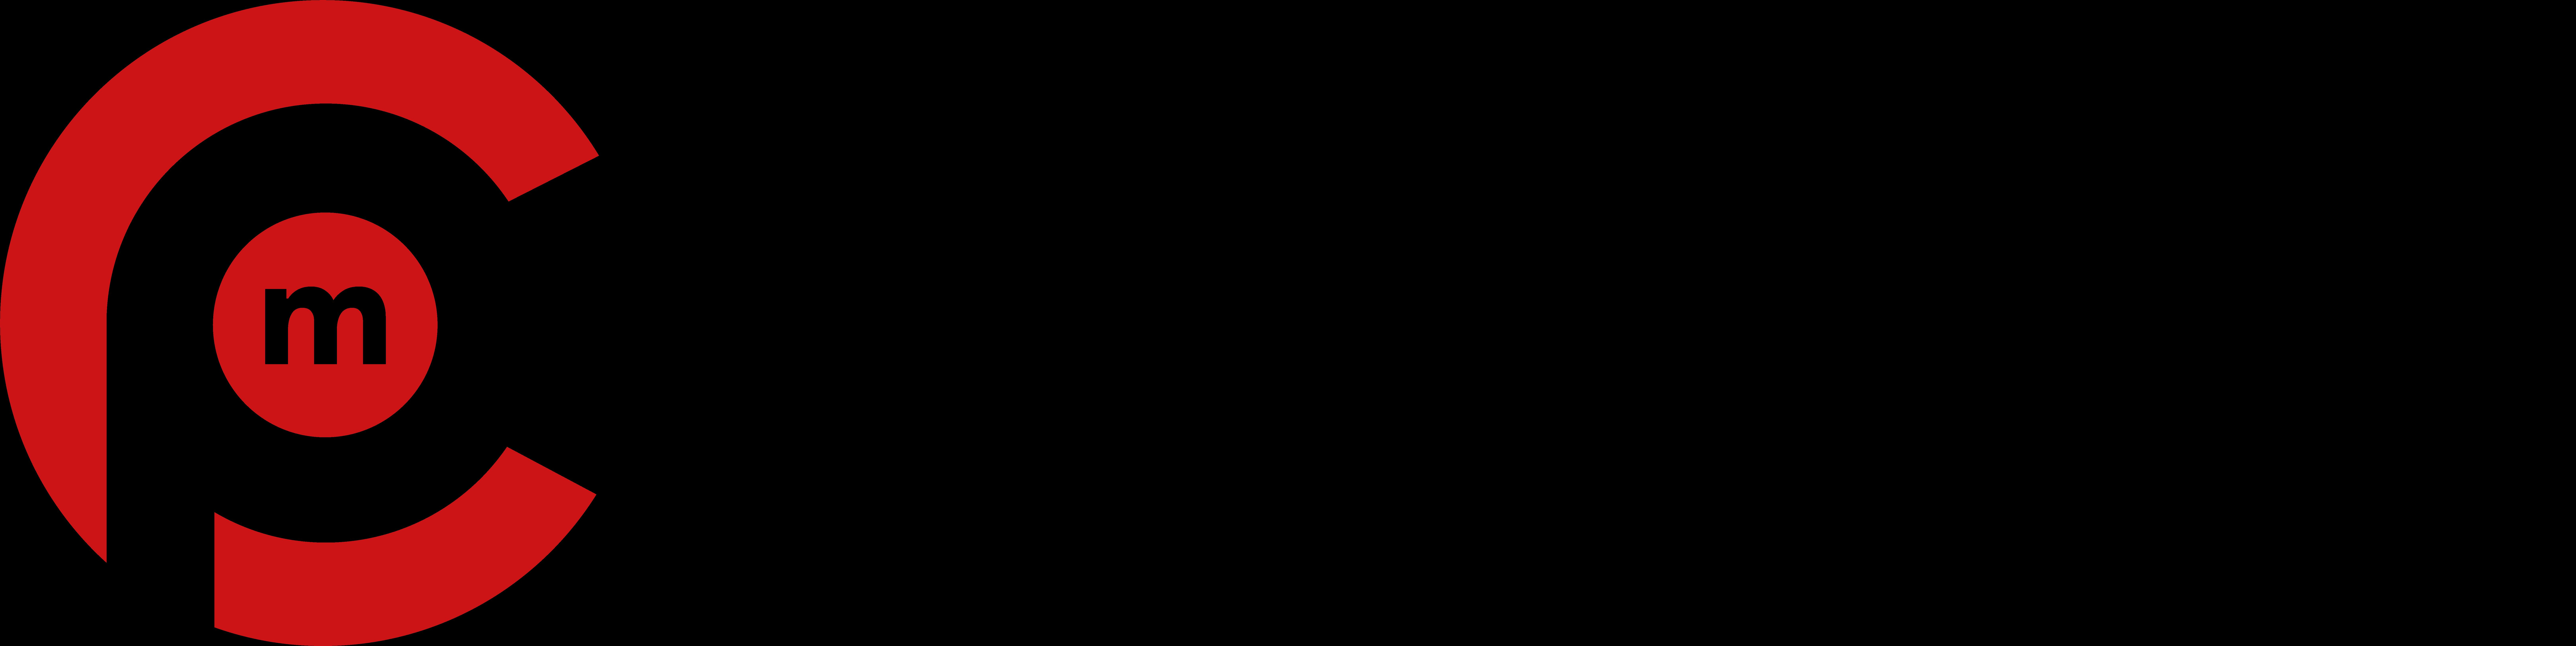 cpmview_logo